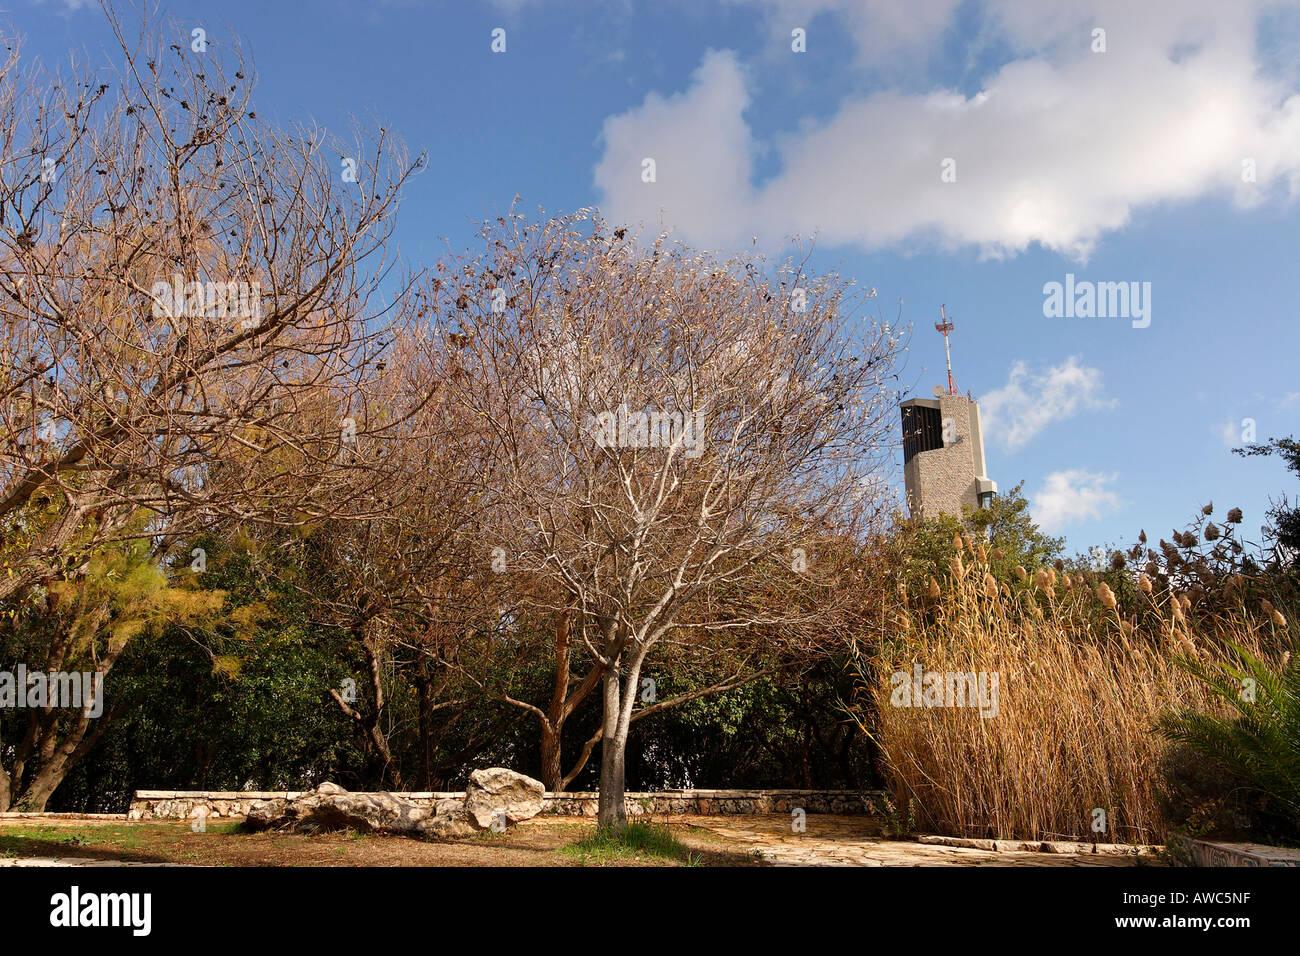 Israel Jerusalem The Hebrew University campus on Mount Scopus the botanical garden - Stock Image